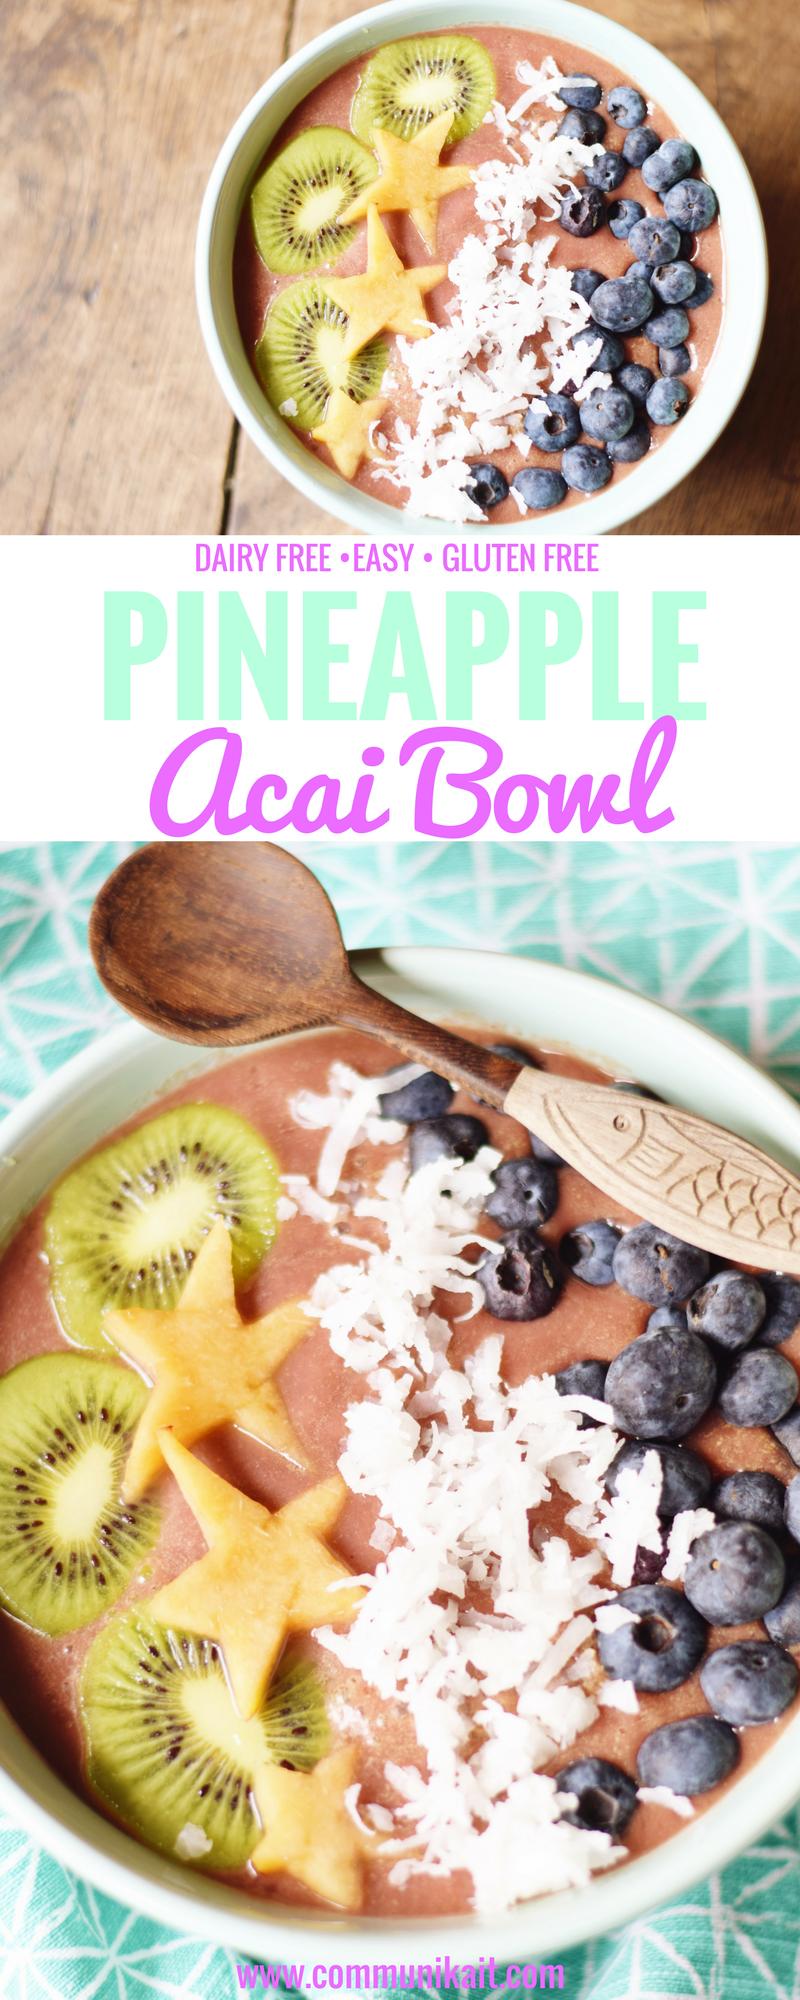 Easy Pineapple Acai Bowl - Acai Bowl Recipe - Easy Acai Bowl - Sambazon Acai Recipe - Acai Bowl Acai Packet - Simple Acai Smoothie Bowl - How To Make Acai Bowls - Hawaii Acai Bowl - Tropical Fruit Smoothie Bowl - Communikait by Kait Hanson